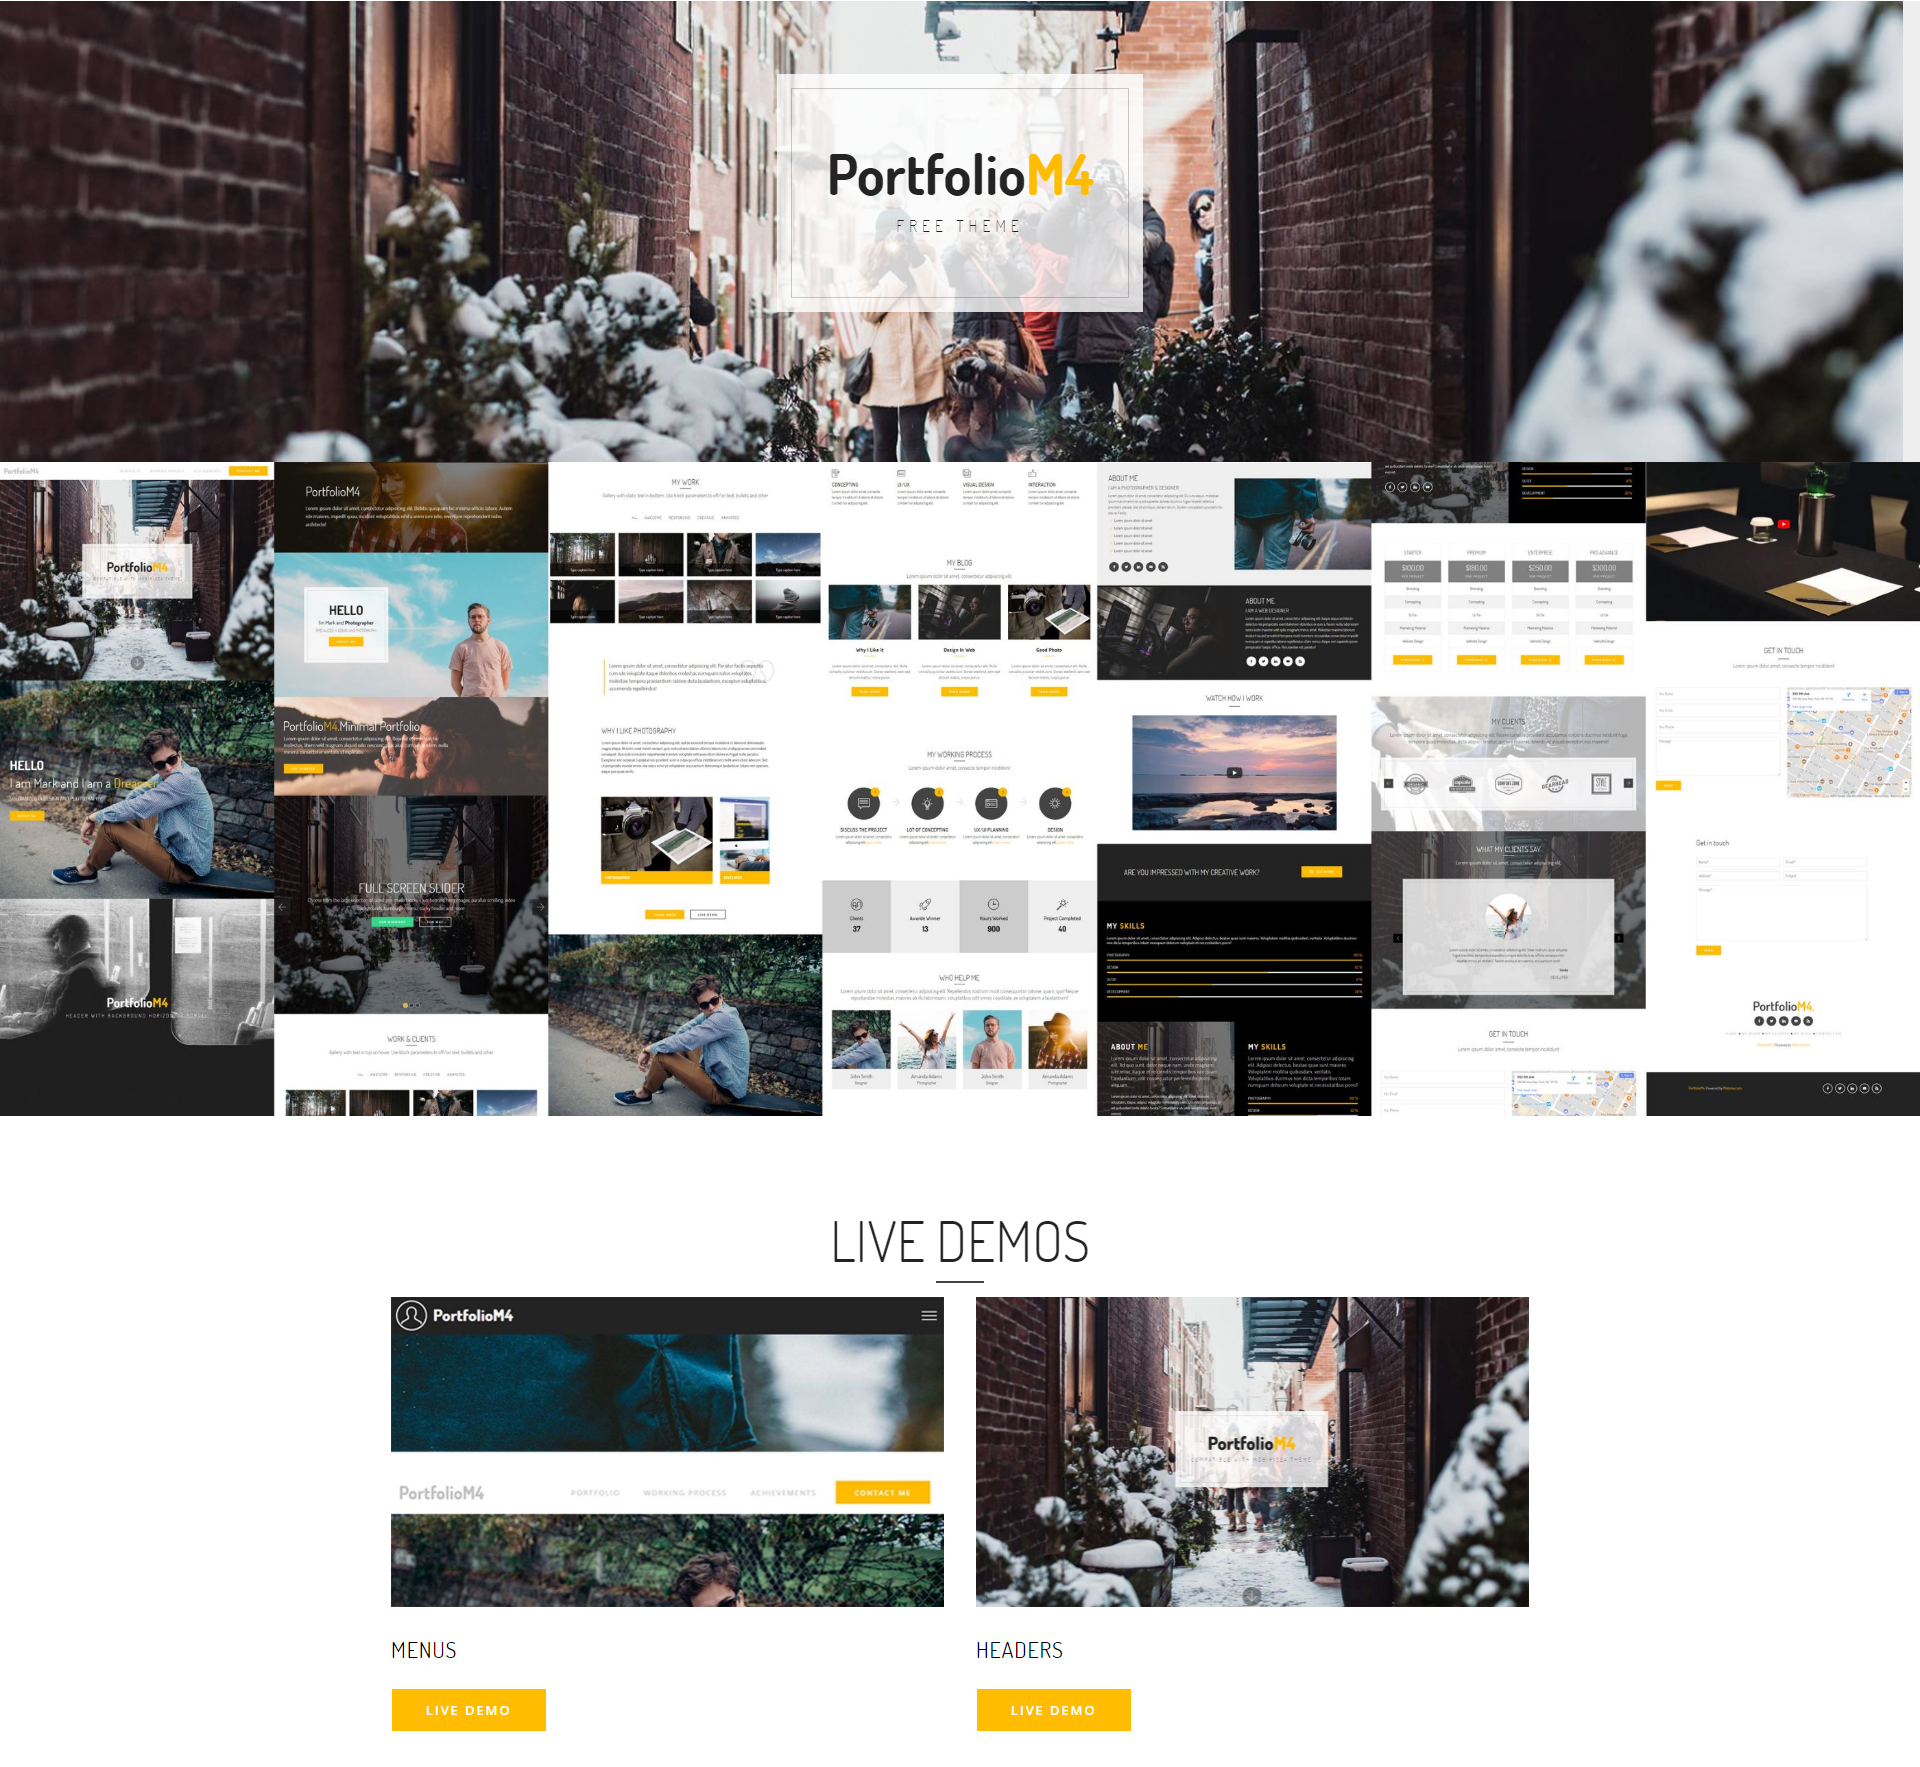 Responsive Bootstrap PortfolioM4 Themes